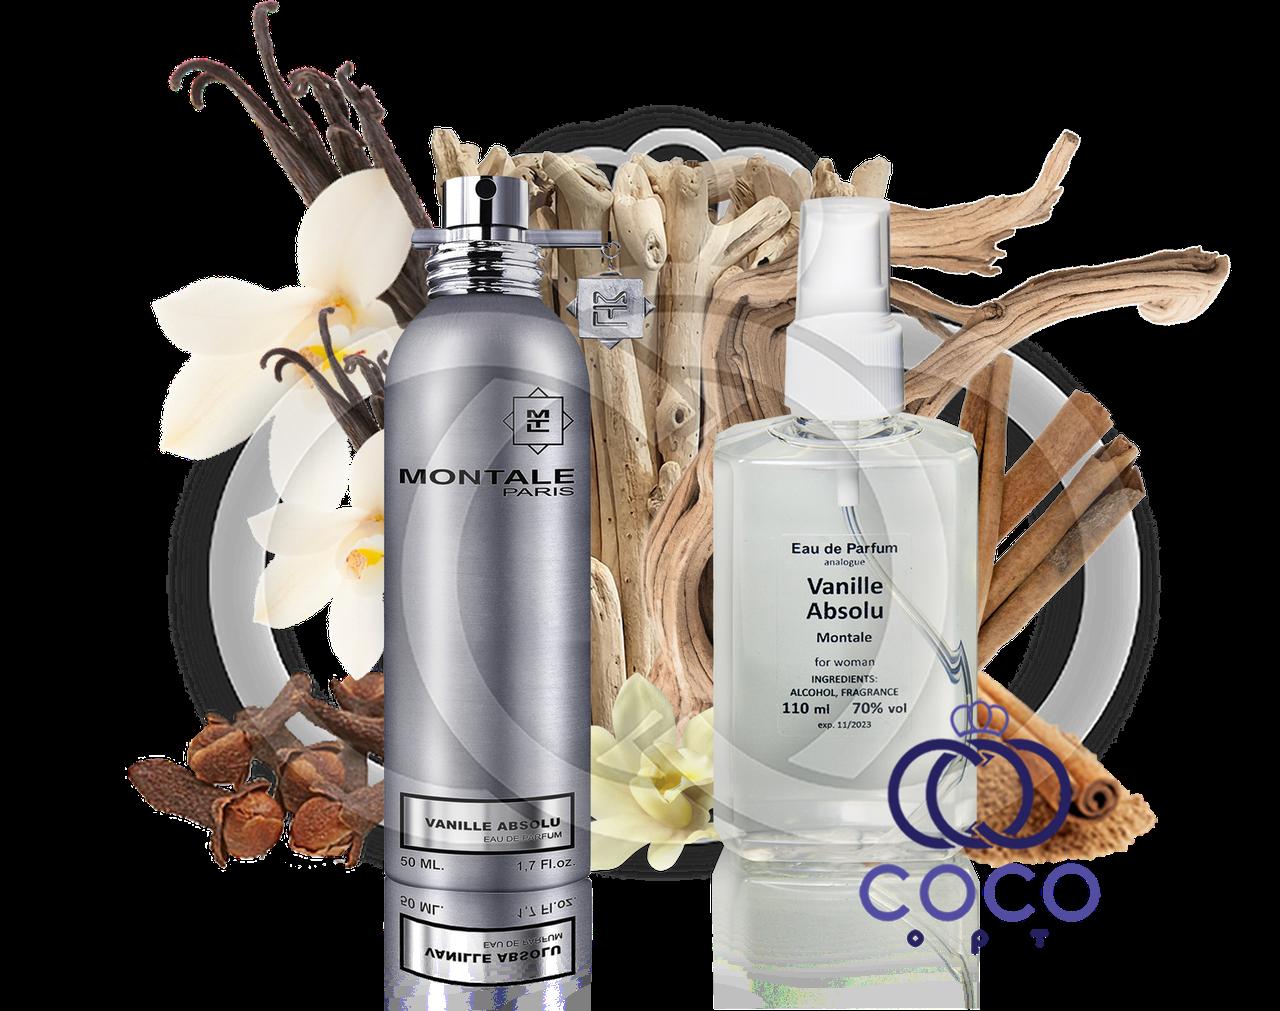 Жіноча парфумована вода Montale Vanille Absolu 110 Ml ОАЕ в пластиковій пляшці